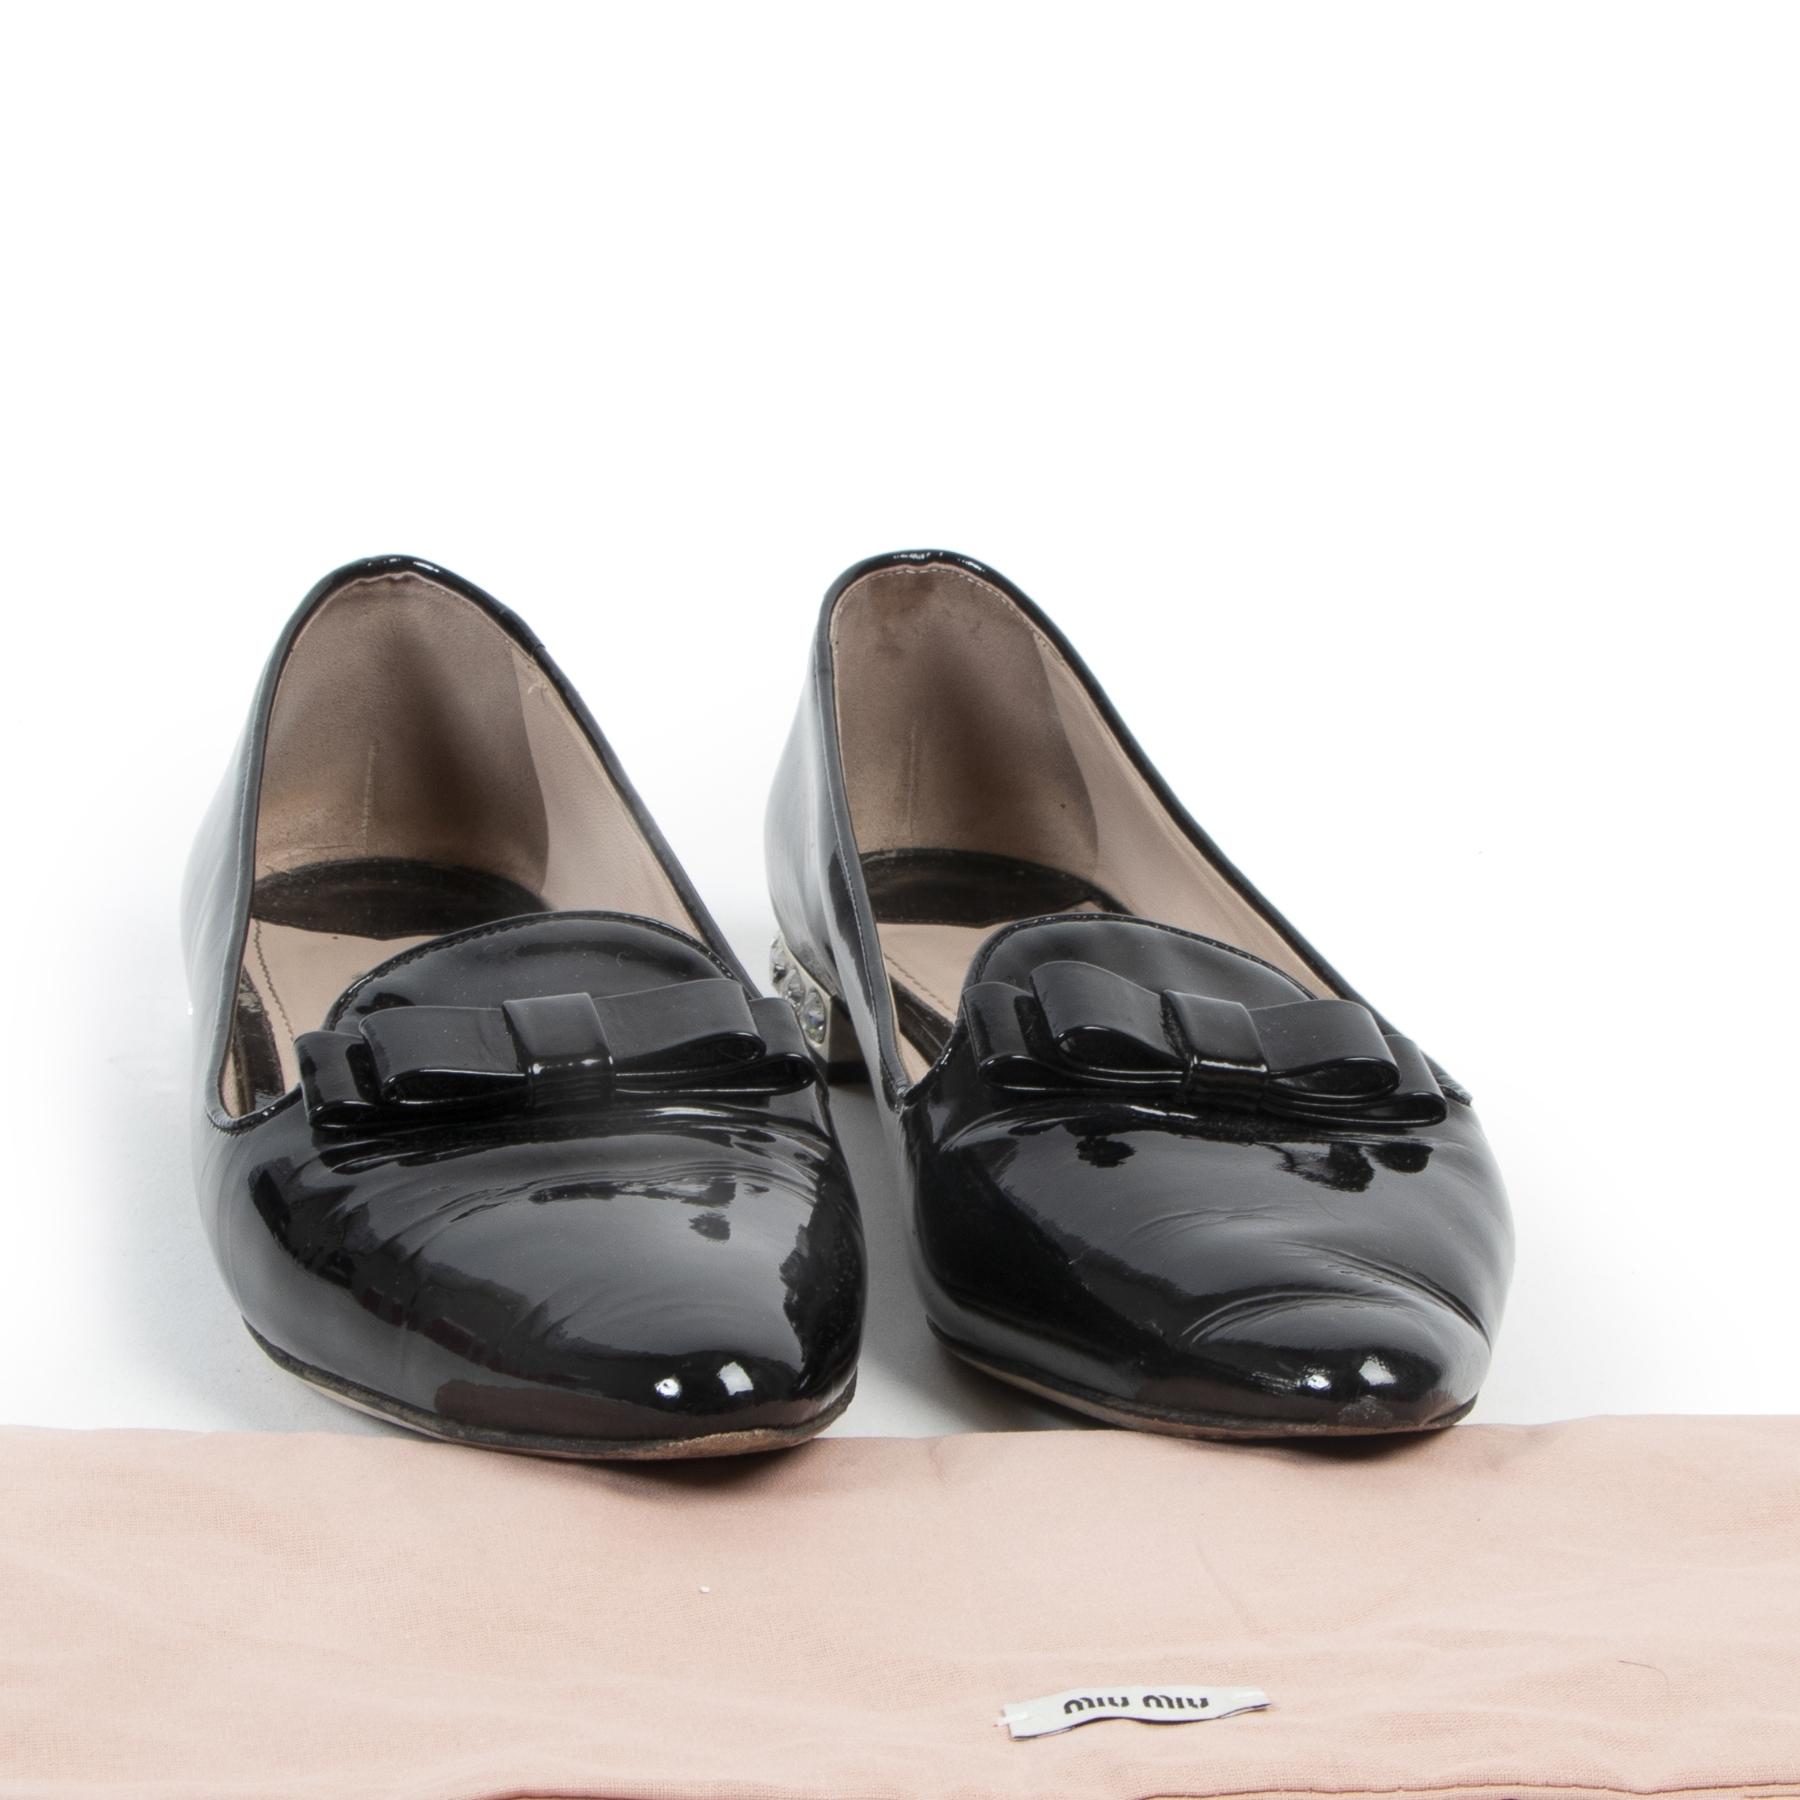 Miu Miu Patent Point Toe Flats